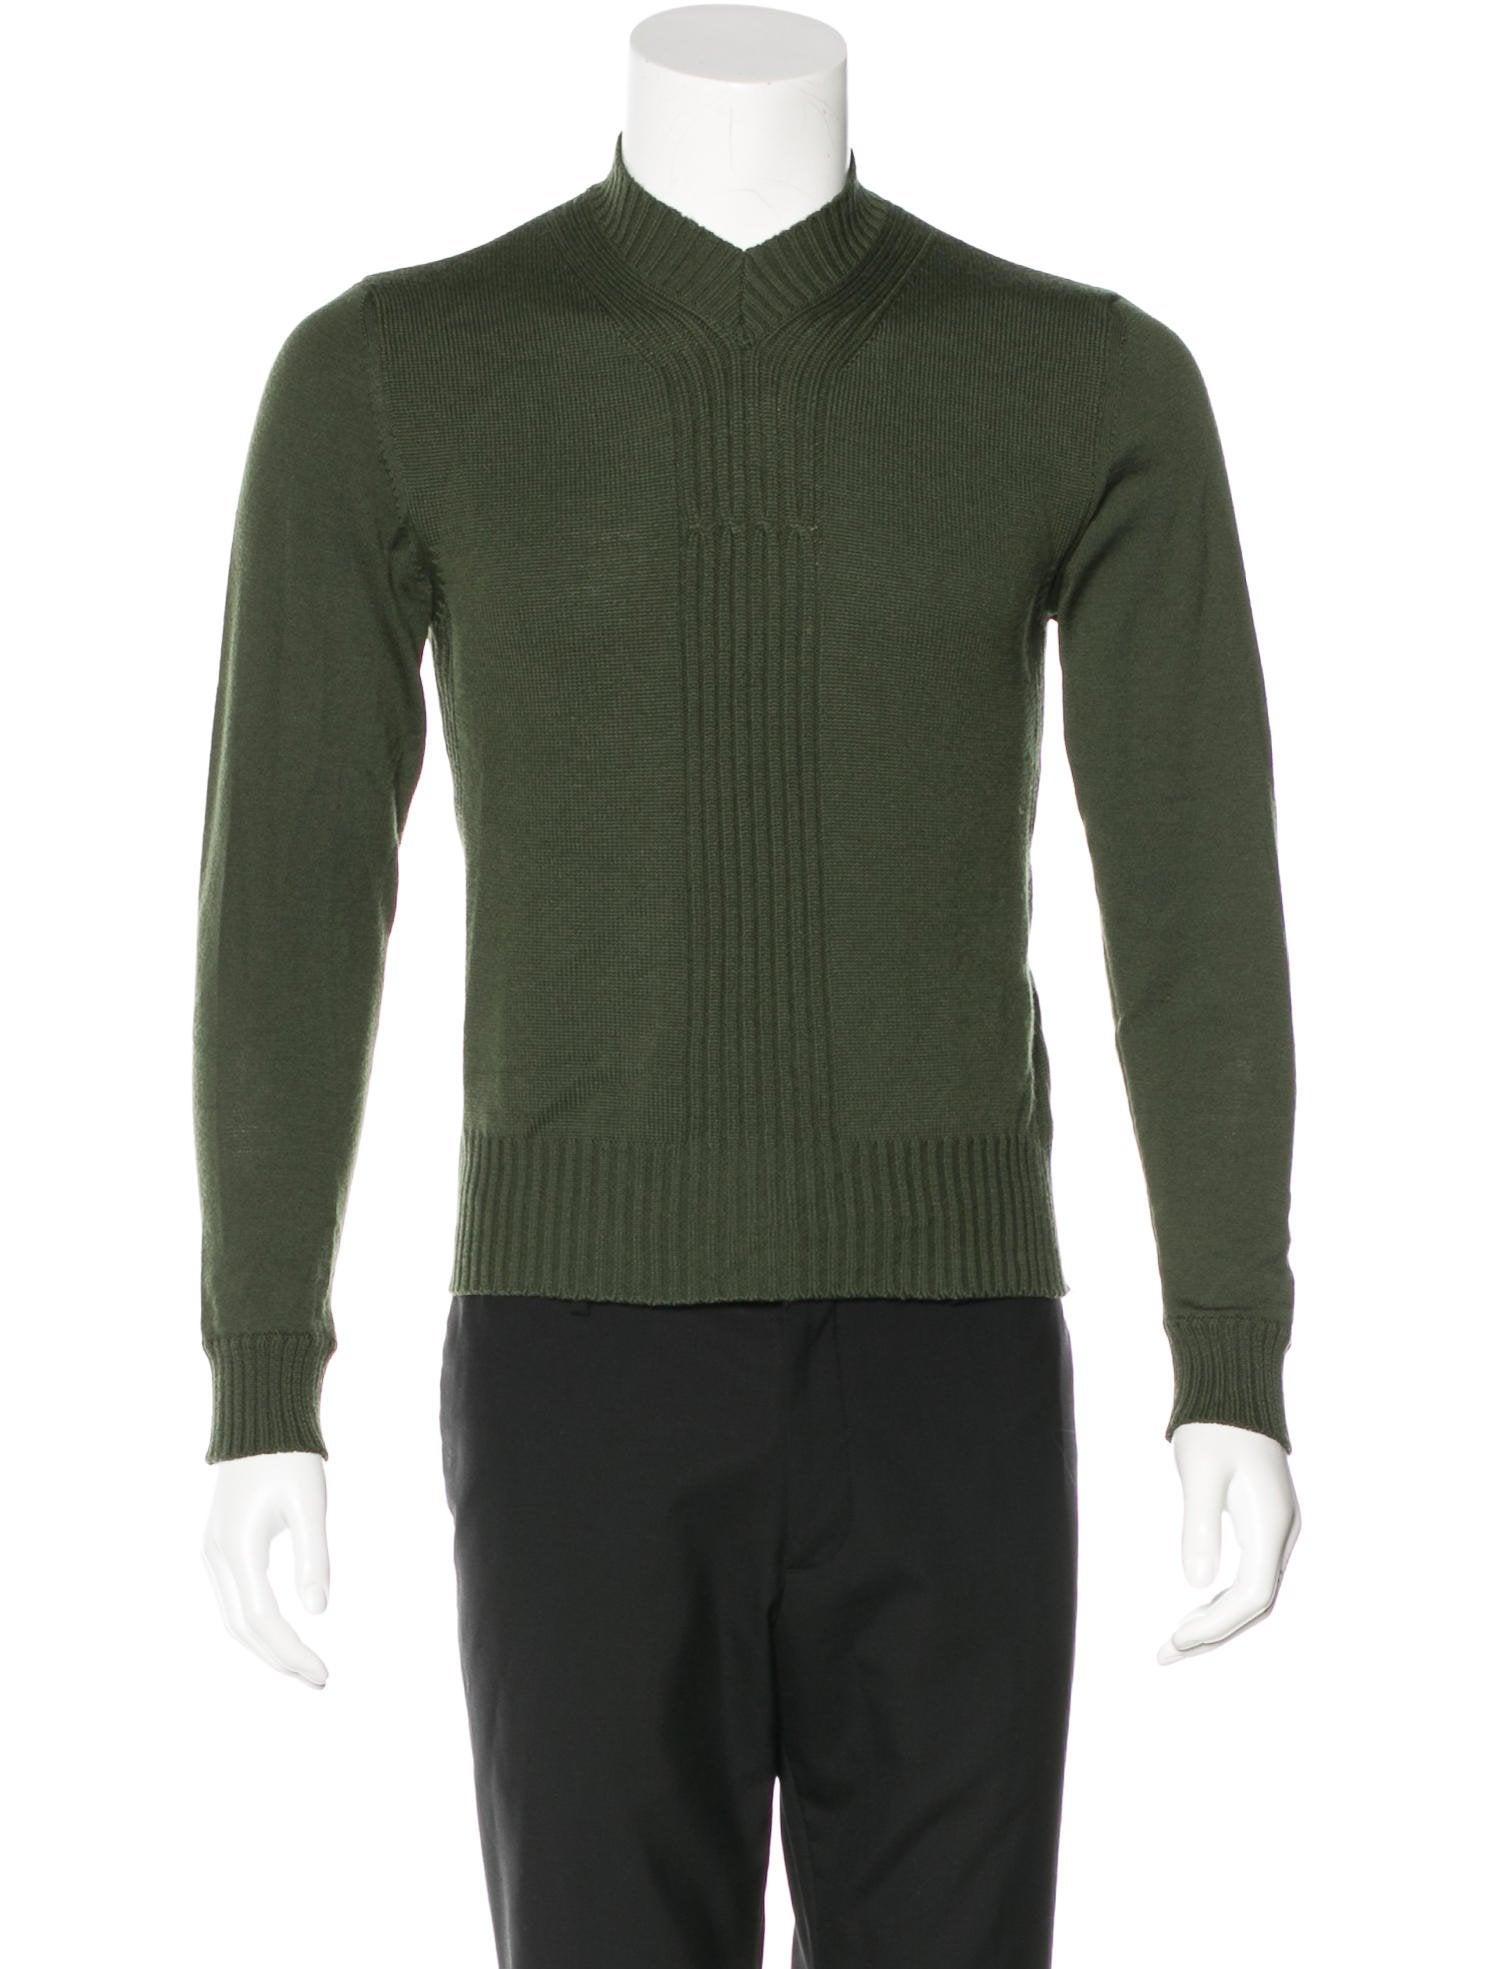 John Bartlett Wool Cropped Sweater - Clothing - JBT20040 | The ...